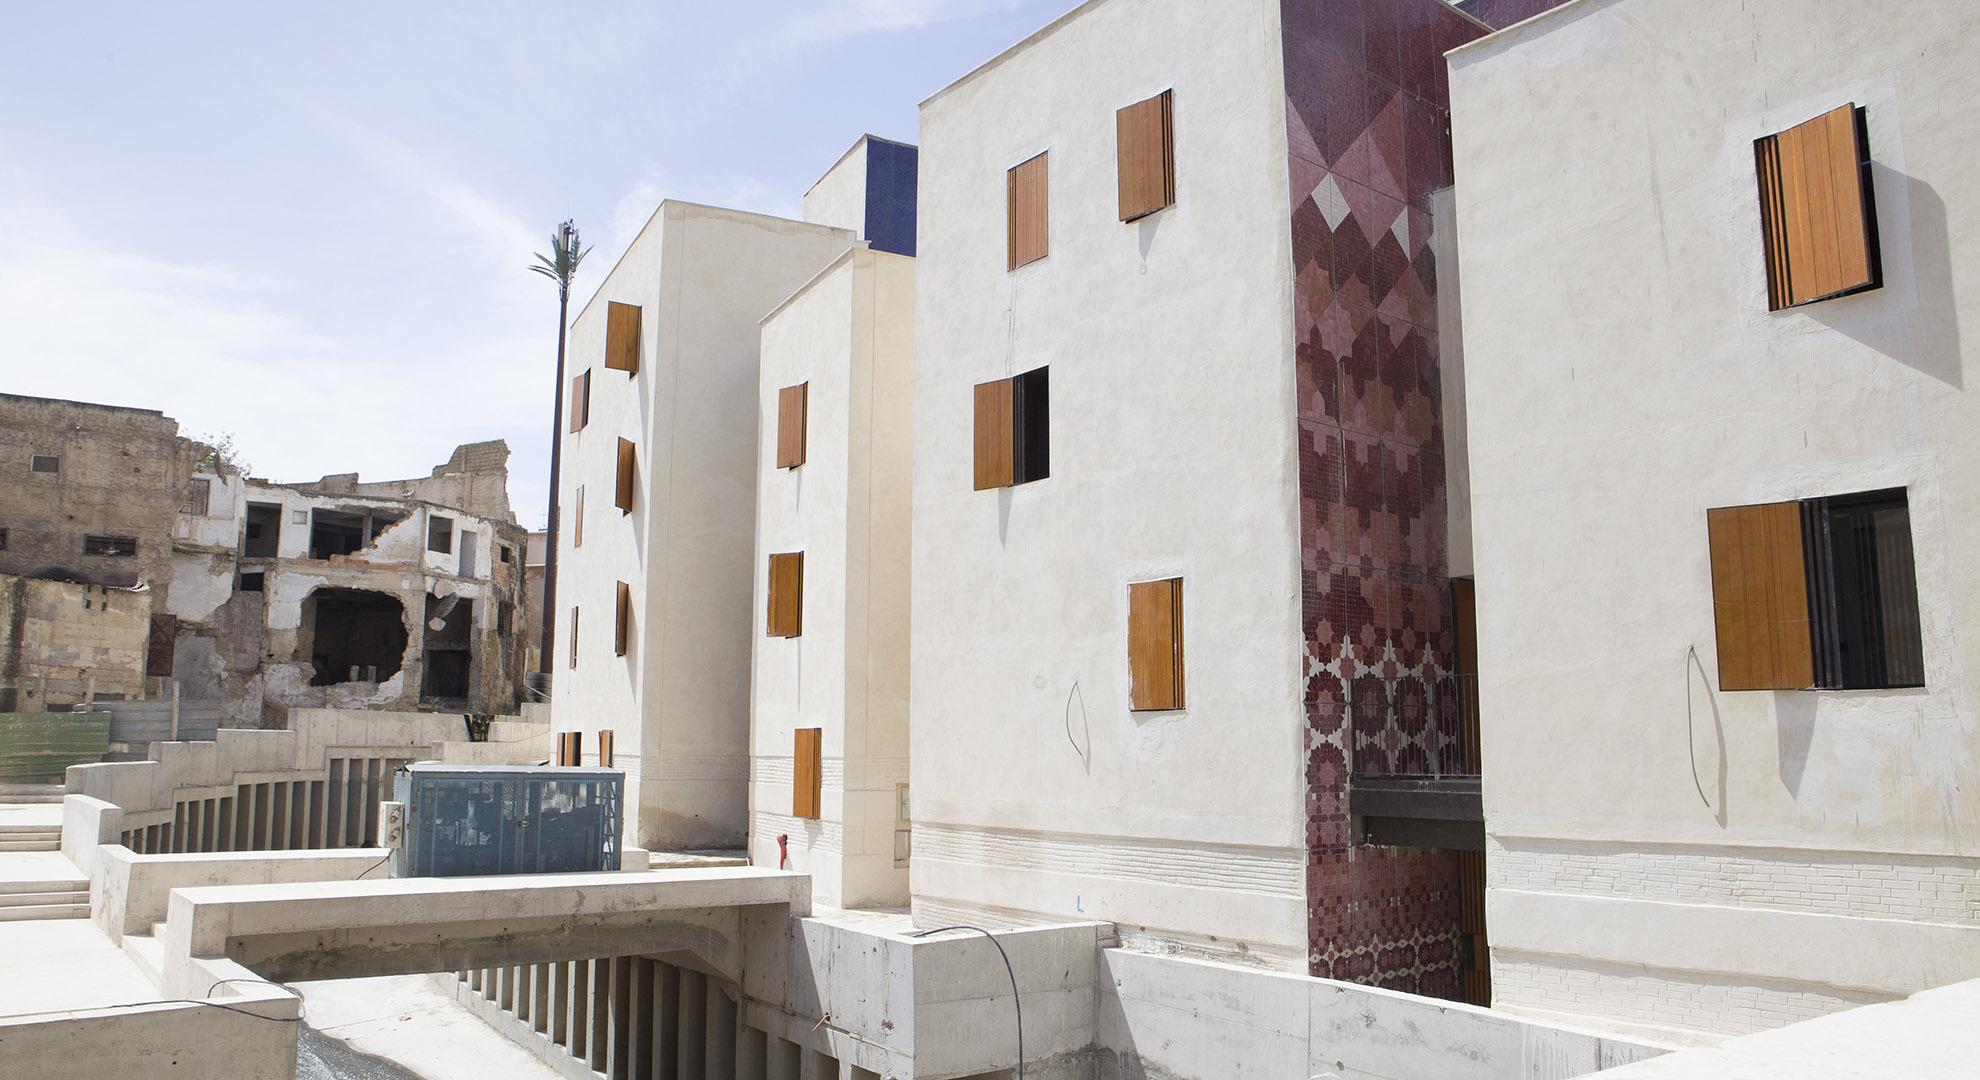 Plaza Lalla Yedounna de la medina de Fez